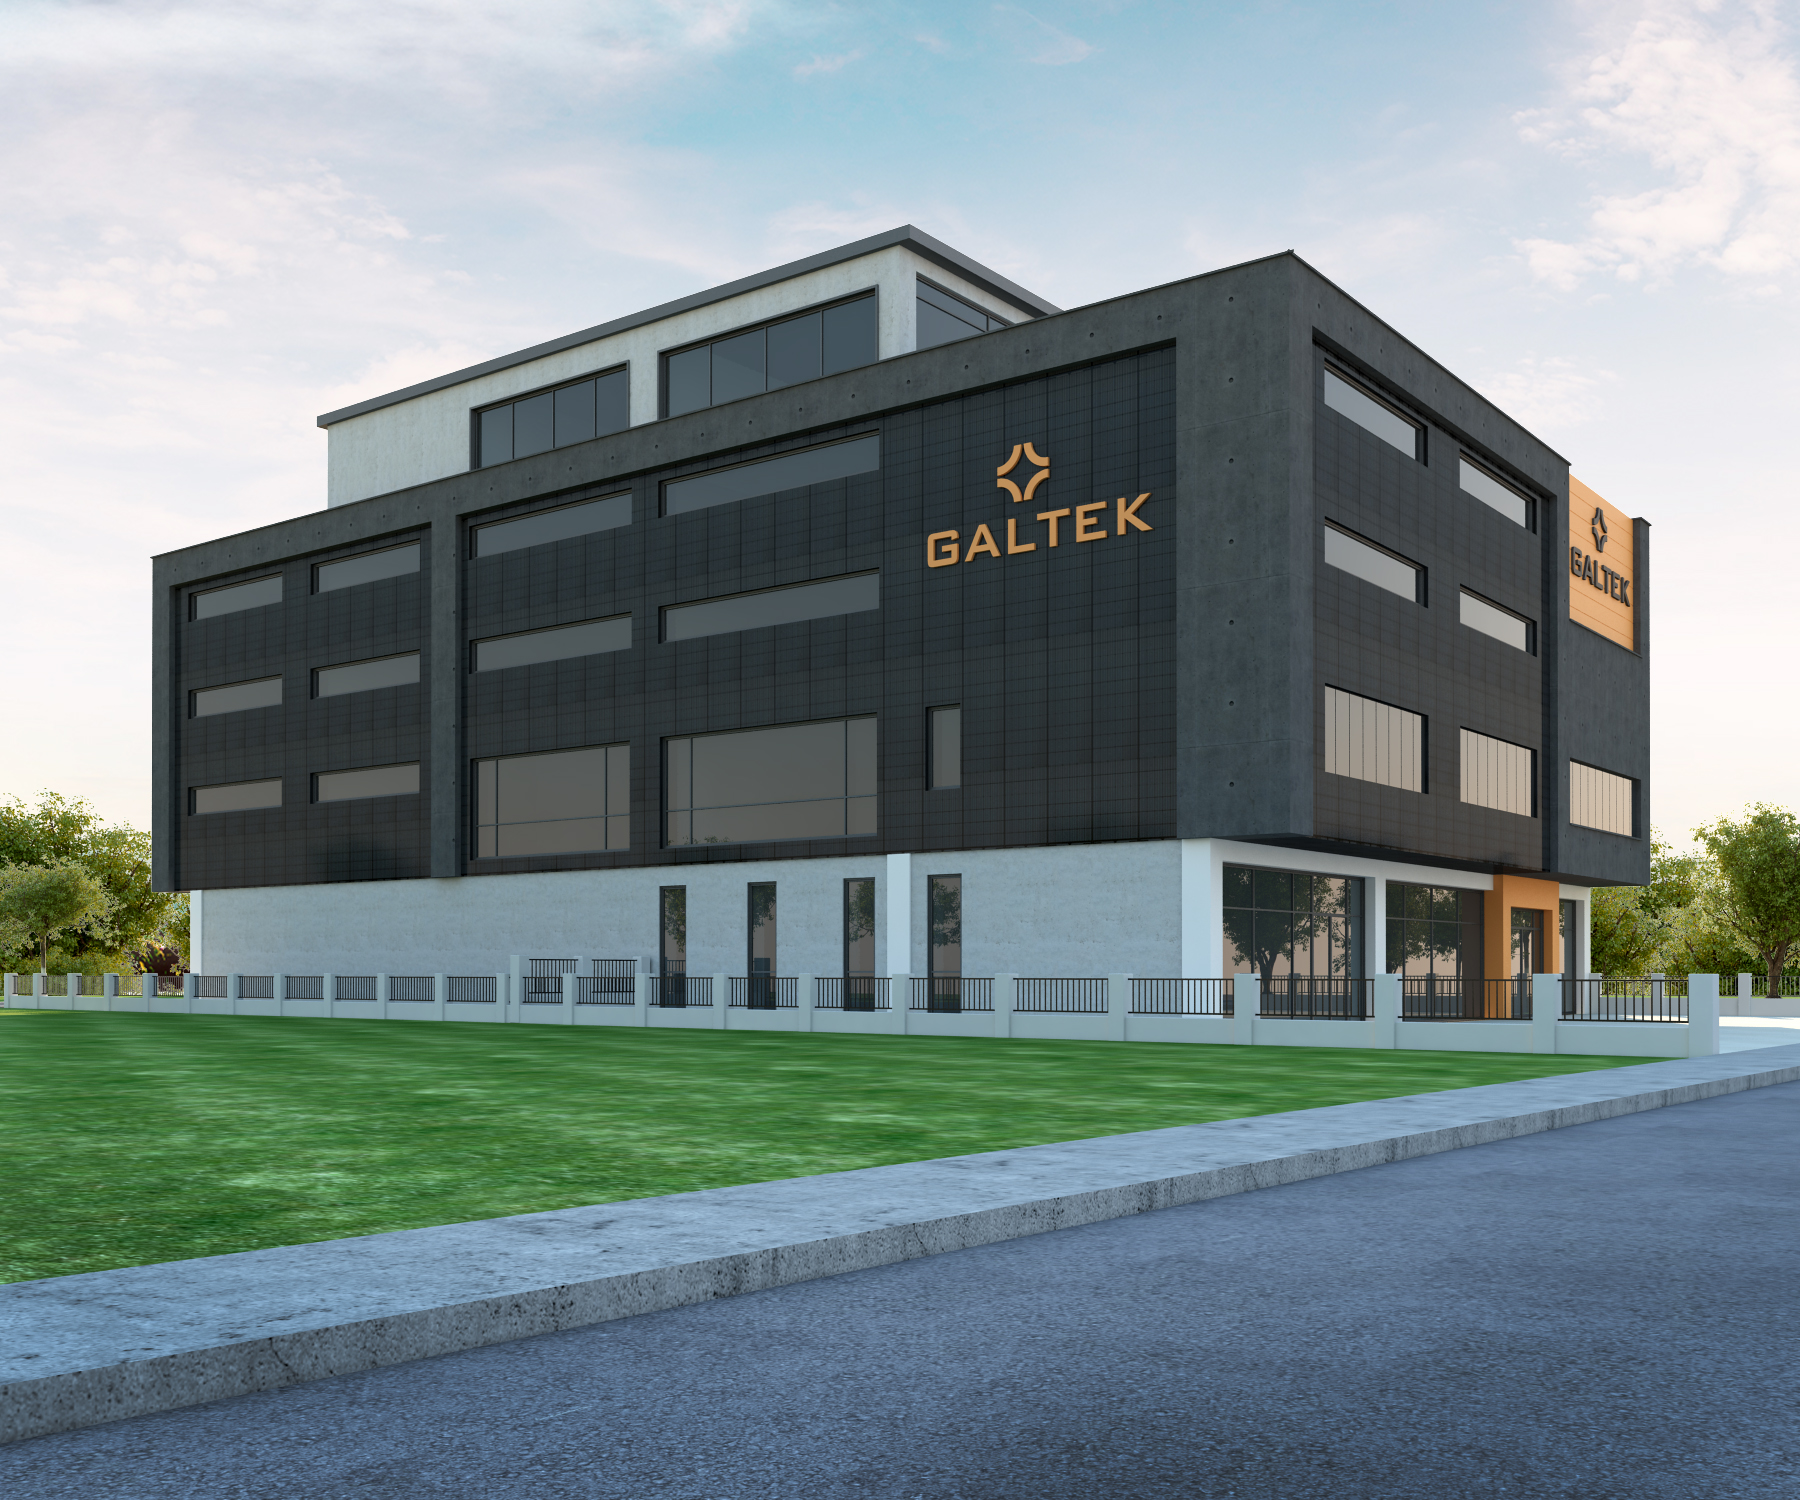 Galtek